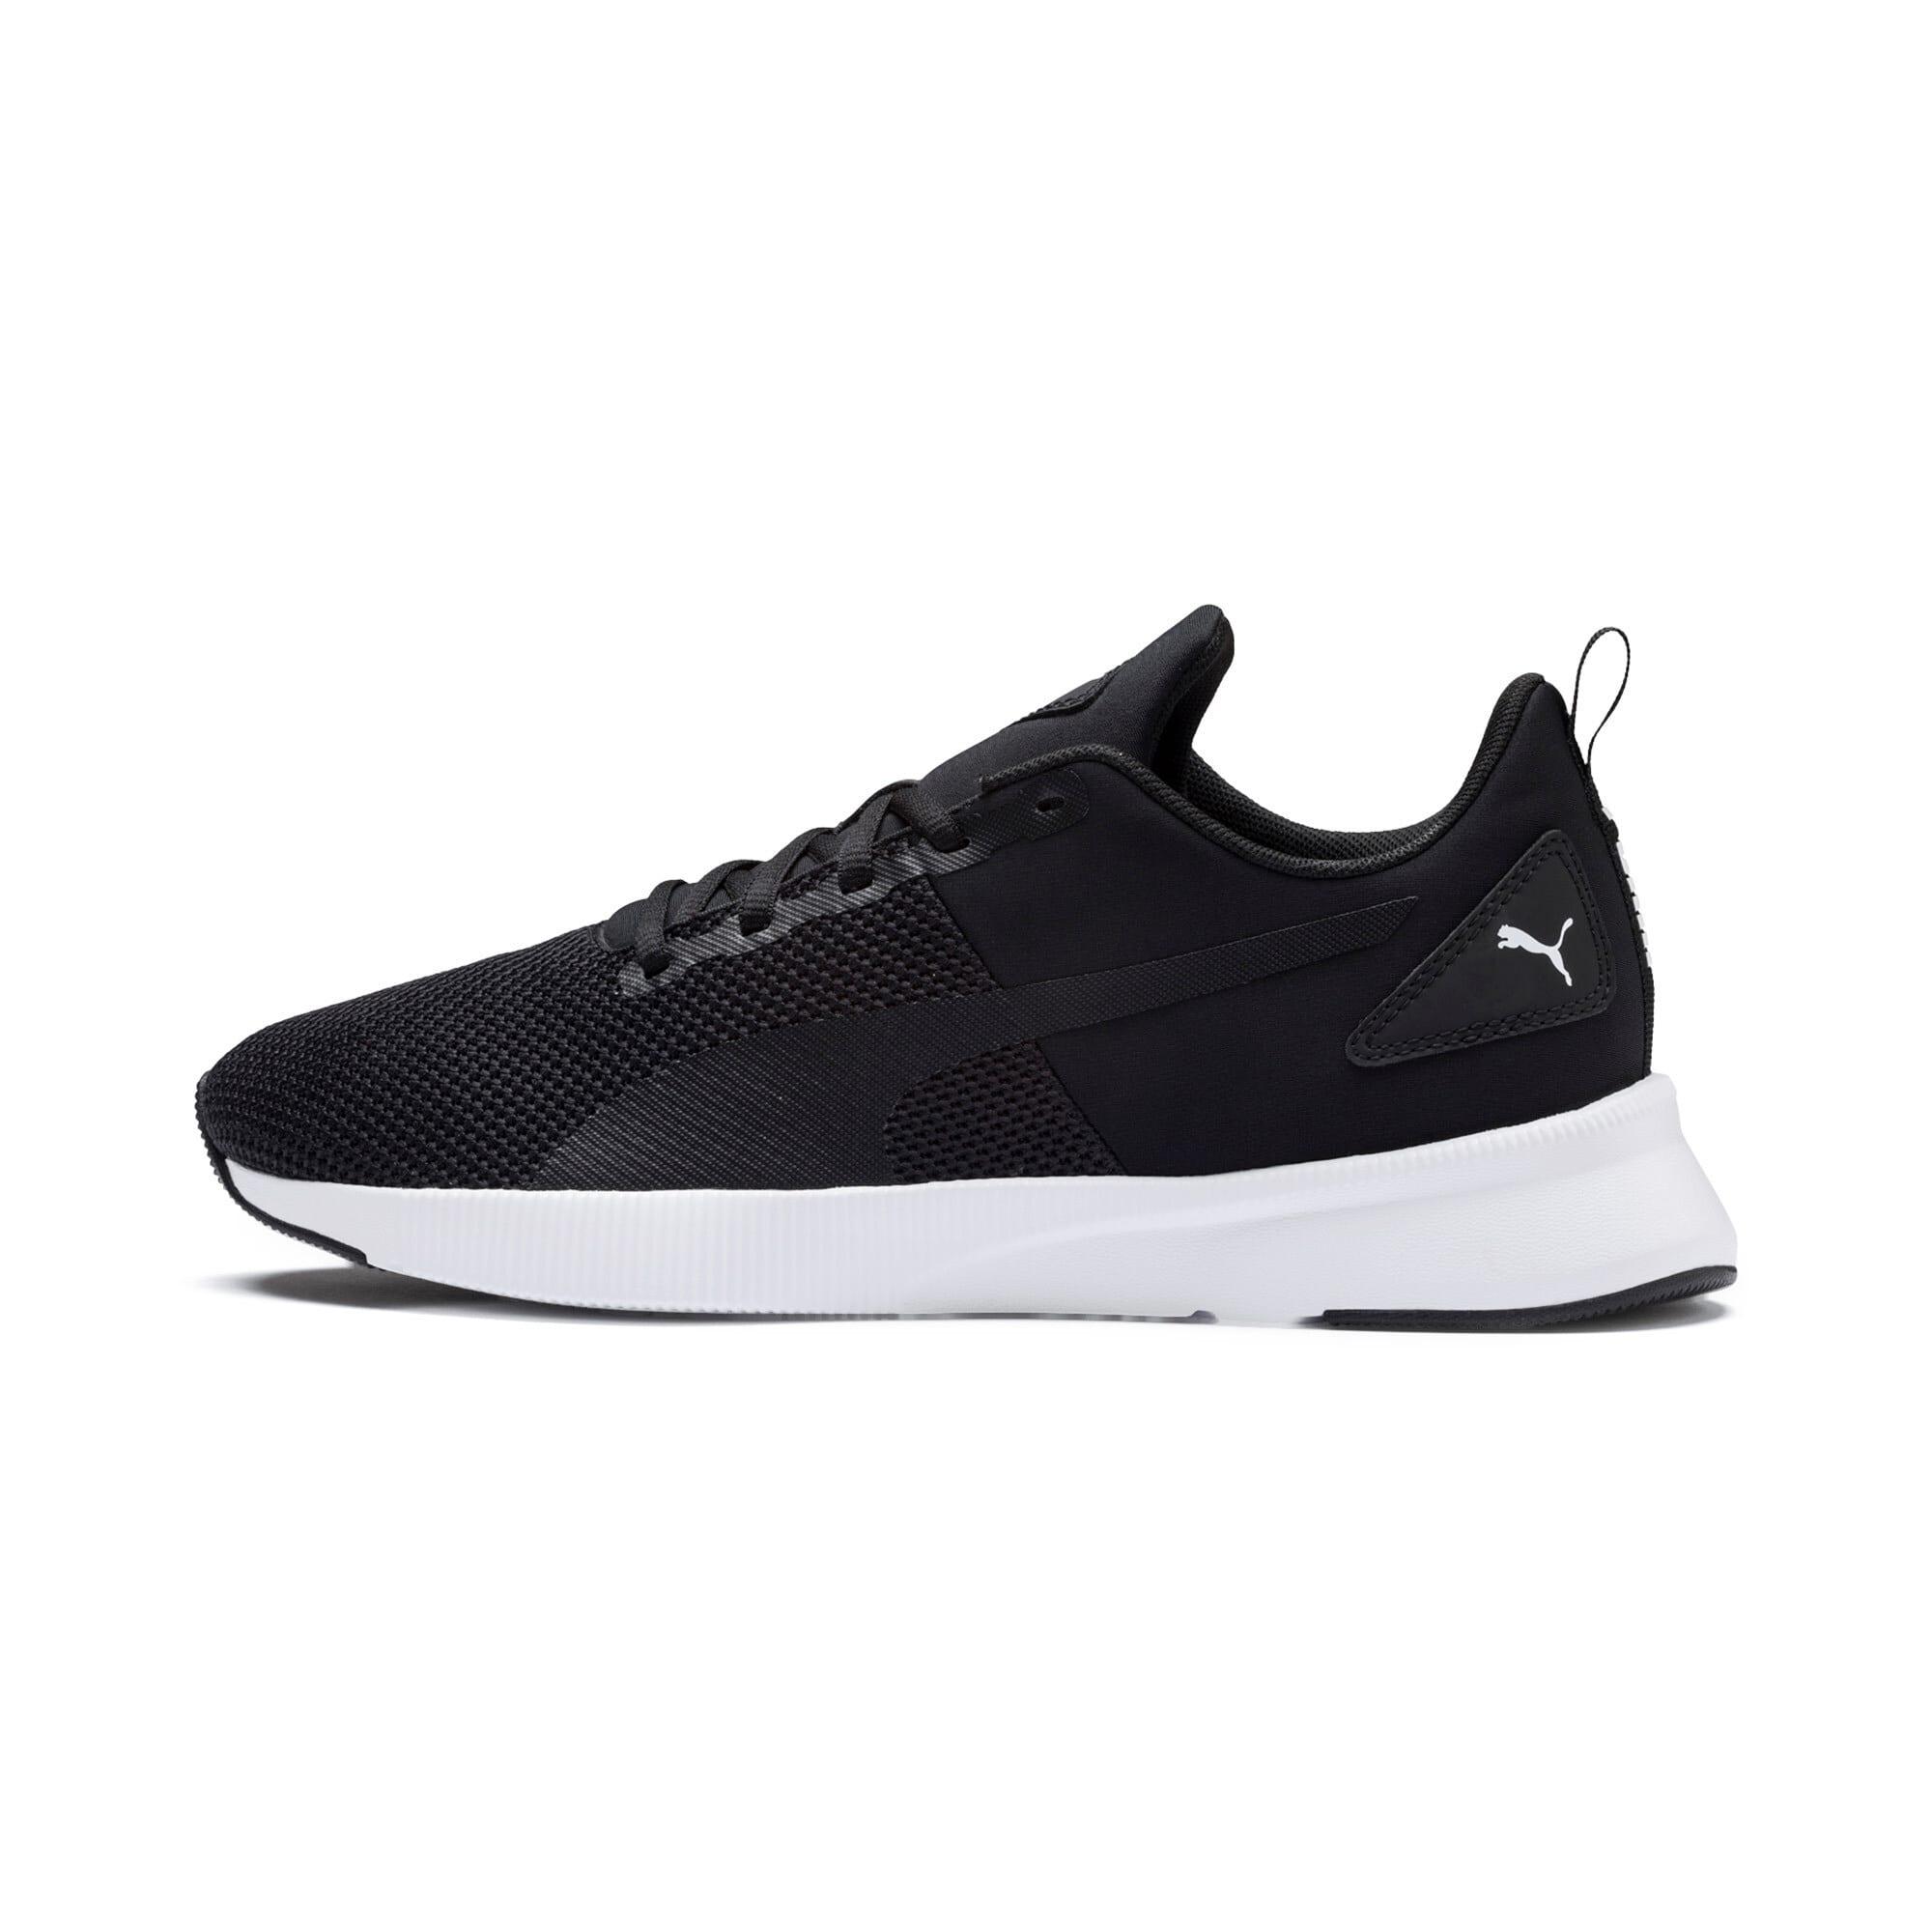 Thumbnail 1 of Flyer Running Shoes, Black-Black-White, medium-IND